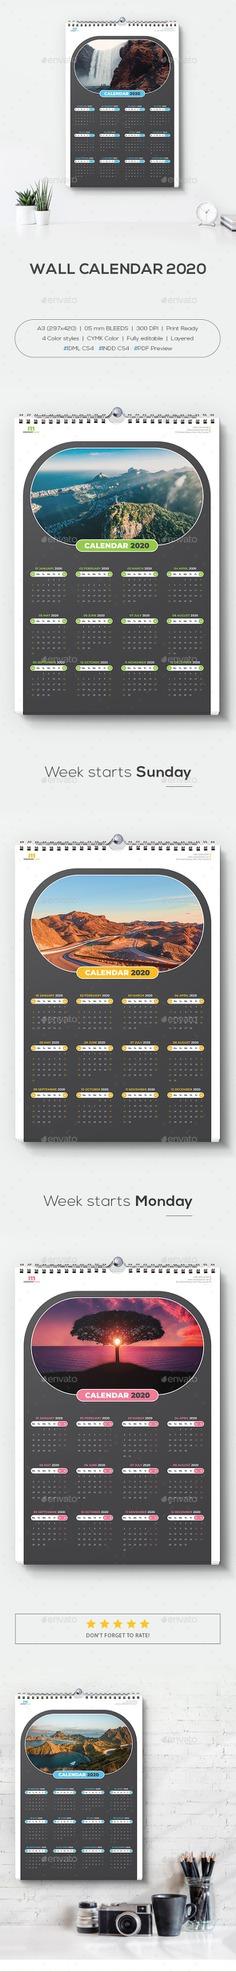 Wall Calendar 2020 - Calendars Stationery Desk Calendar 2020 👇👇More Info /Download : https://graphicriver.net/item/wall-calendar-2020/25008922 #graphicriver #deskcalendar #calendar2020 #calendar #print #stationary #freepik #fiverr #upwork #mstartwork #Behance #Freelance #creative #art #design #envato